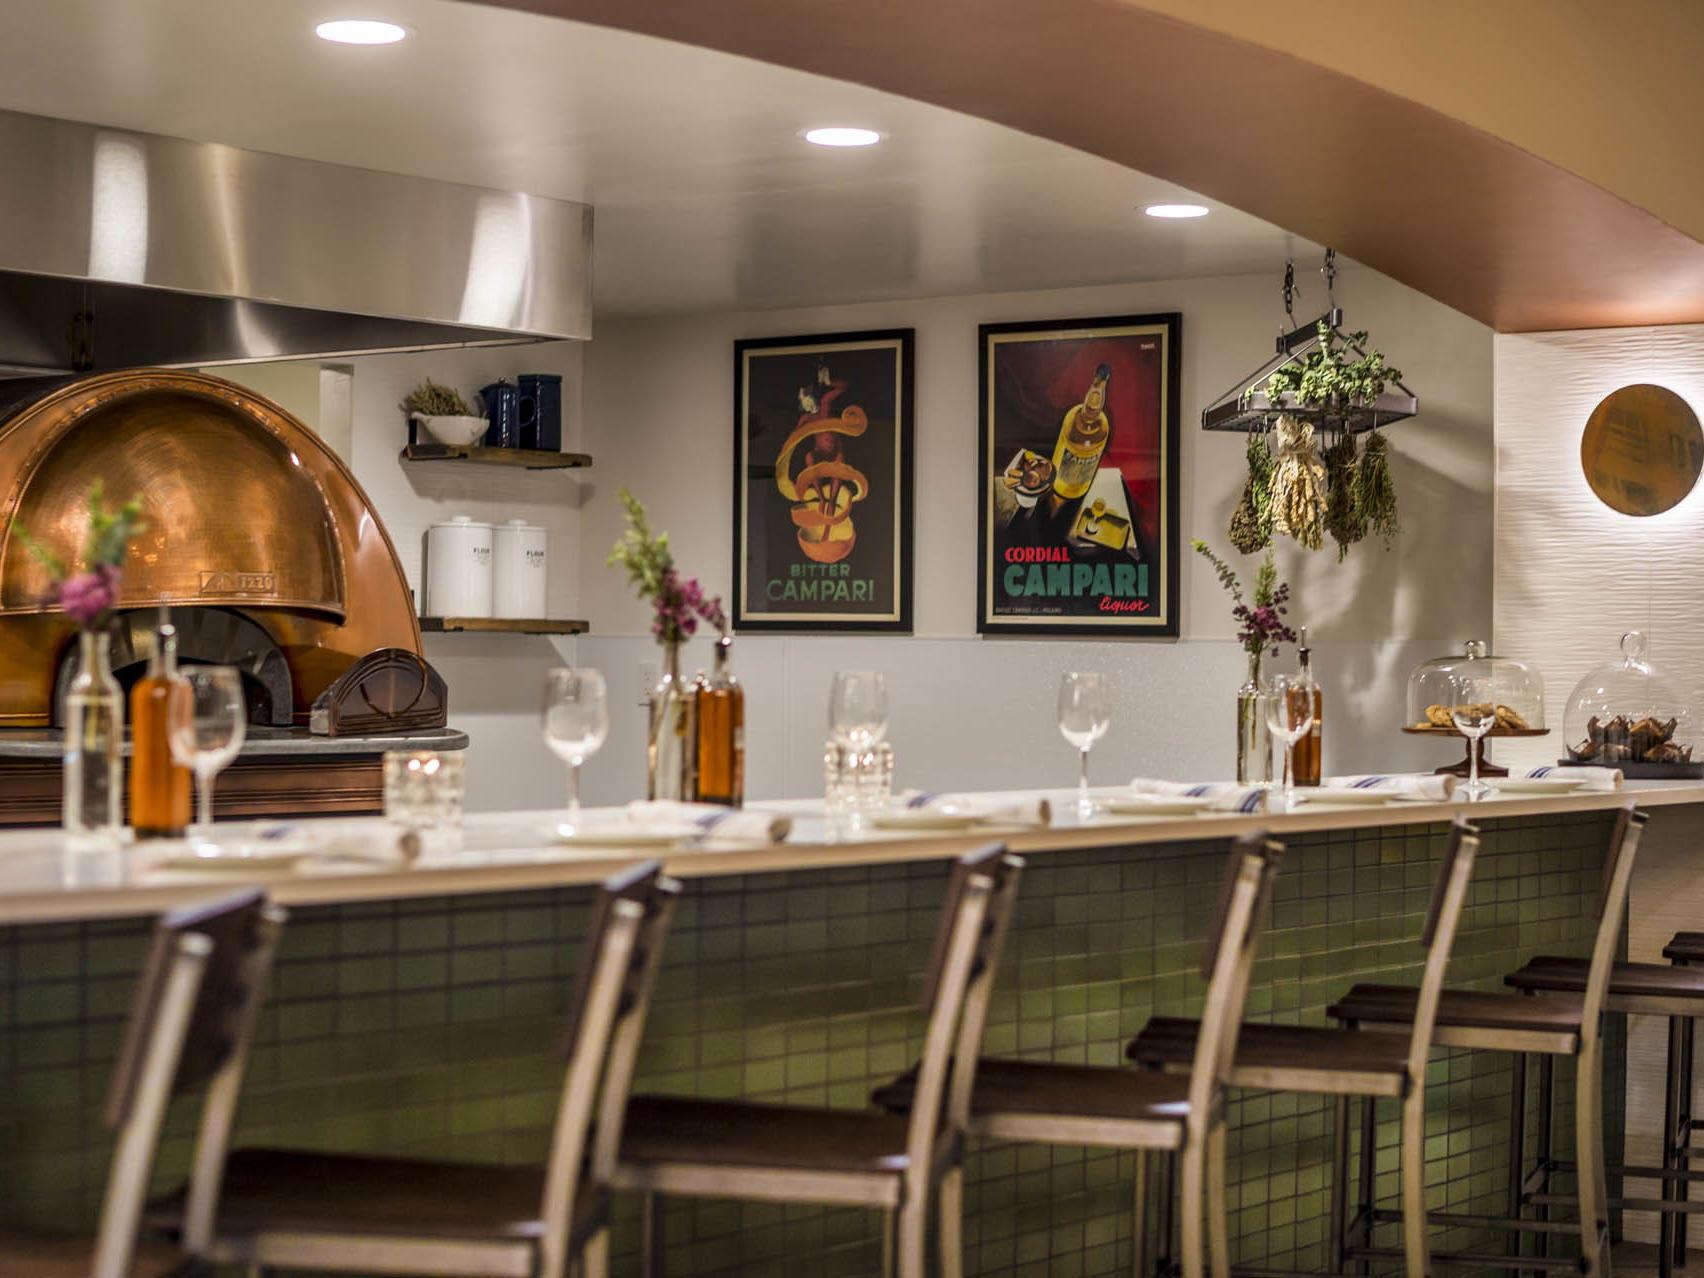 Gattara Restaurant Bar Top Seating